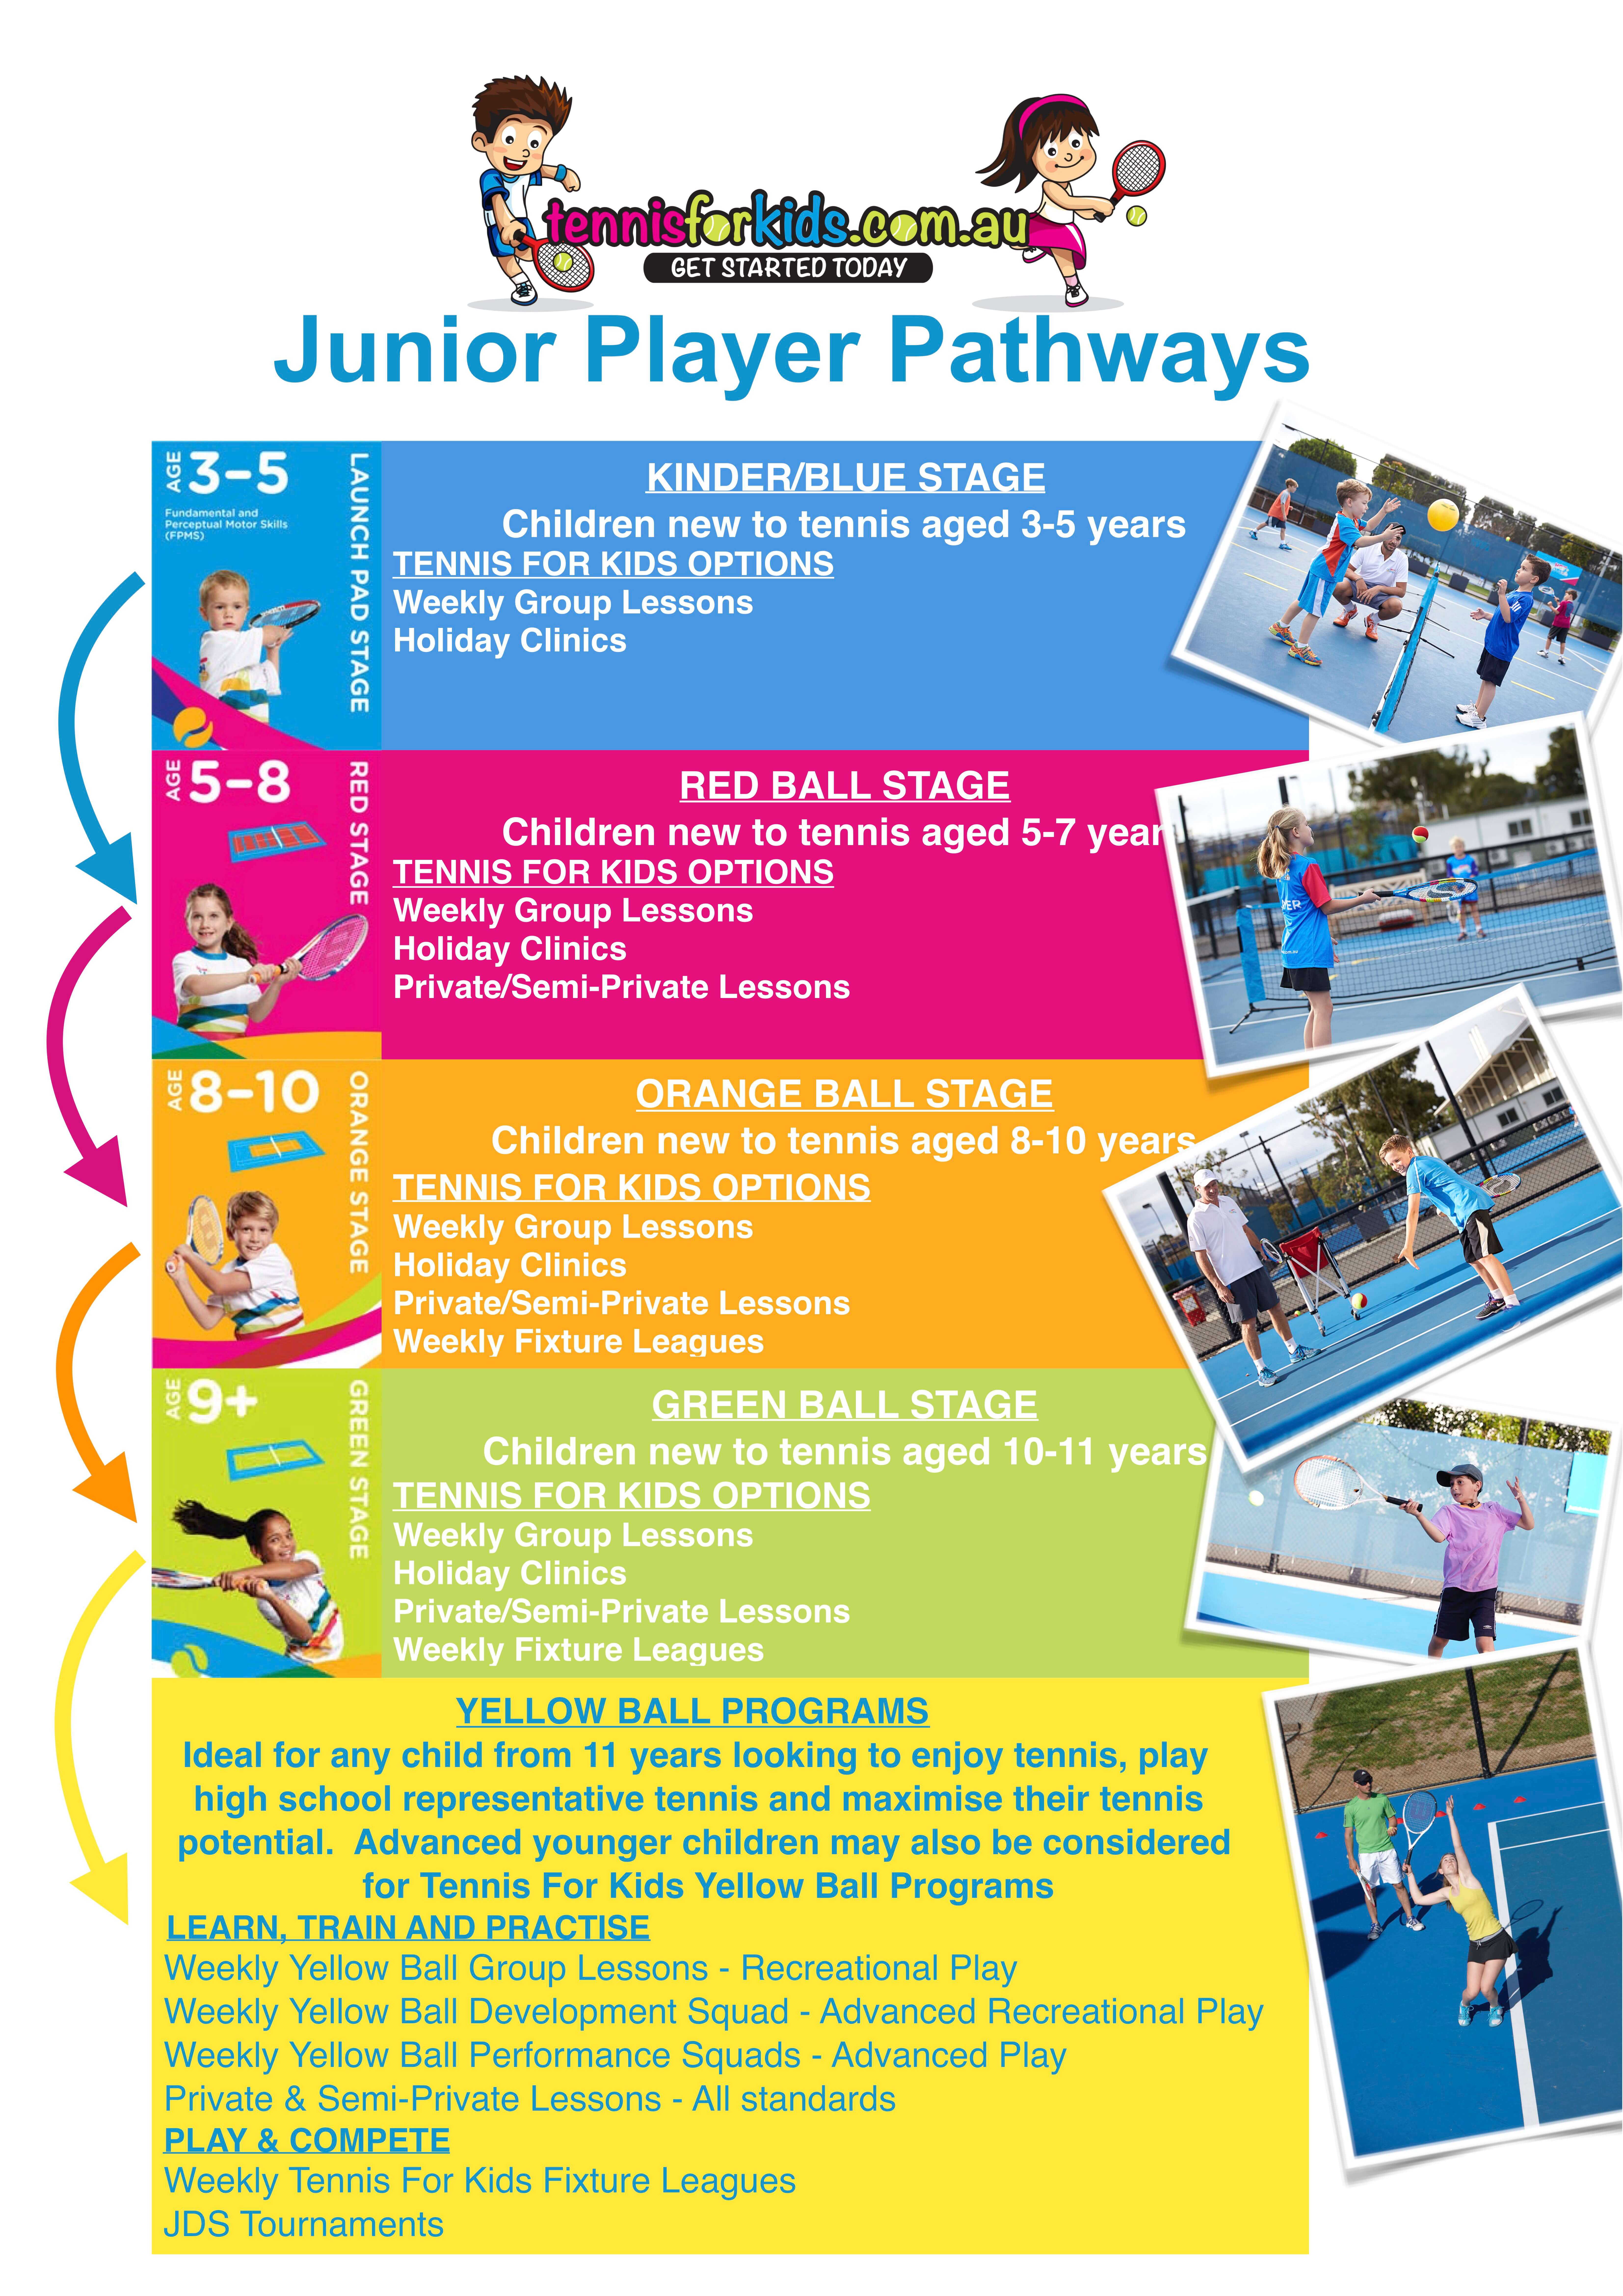 Tennis For Kids Junior Player Pathway